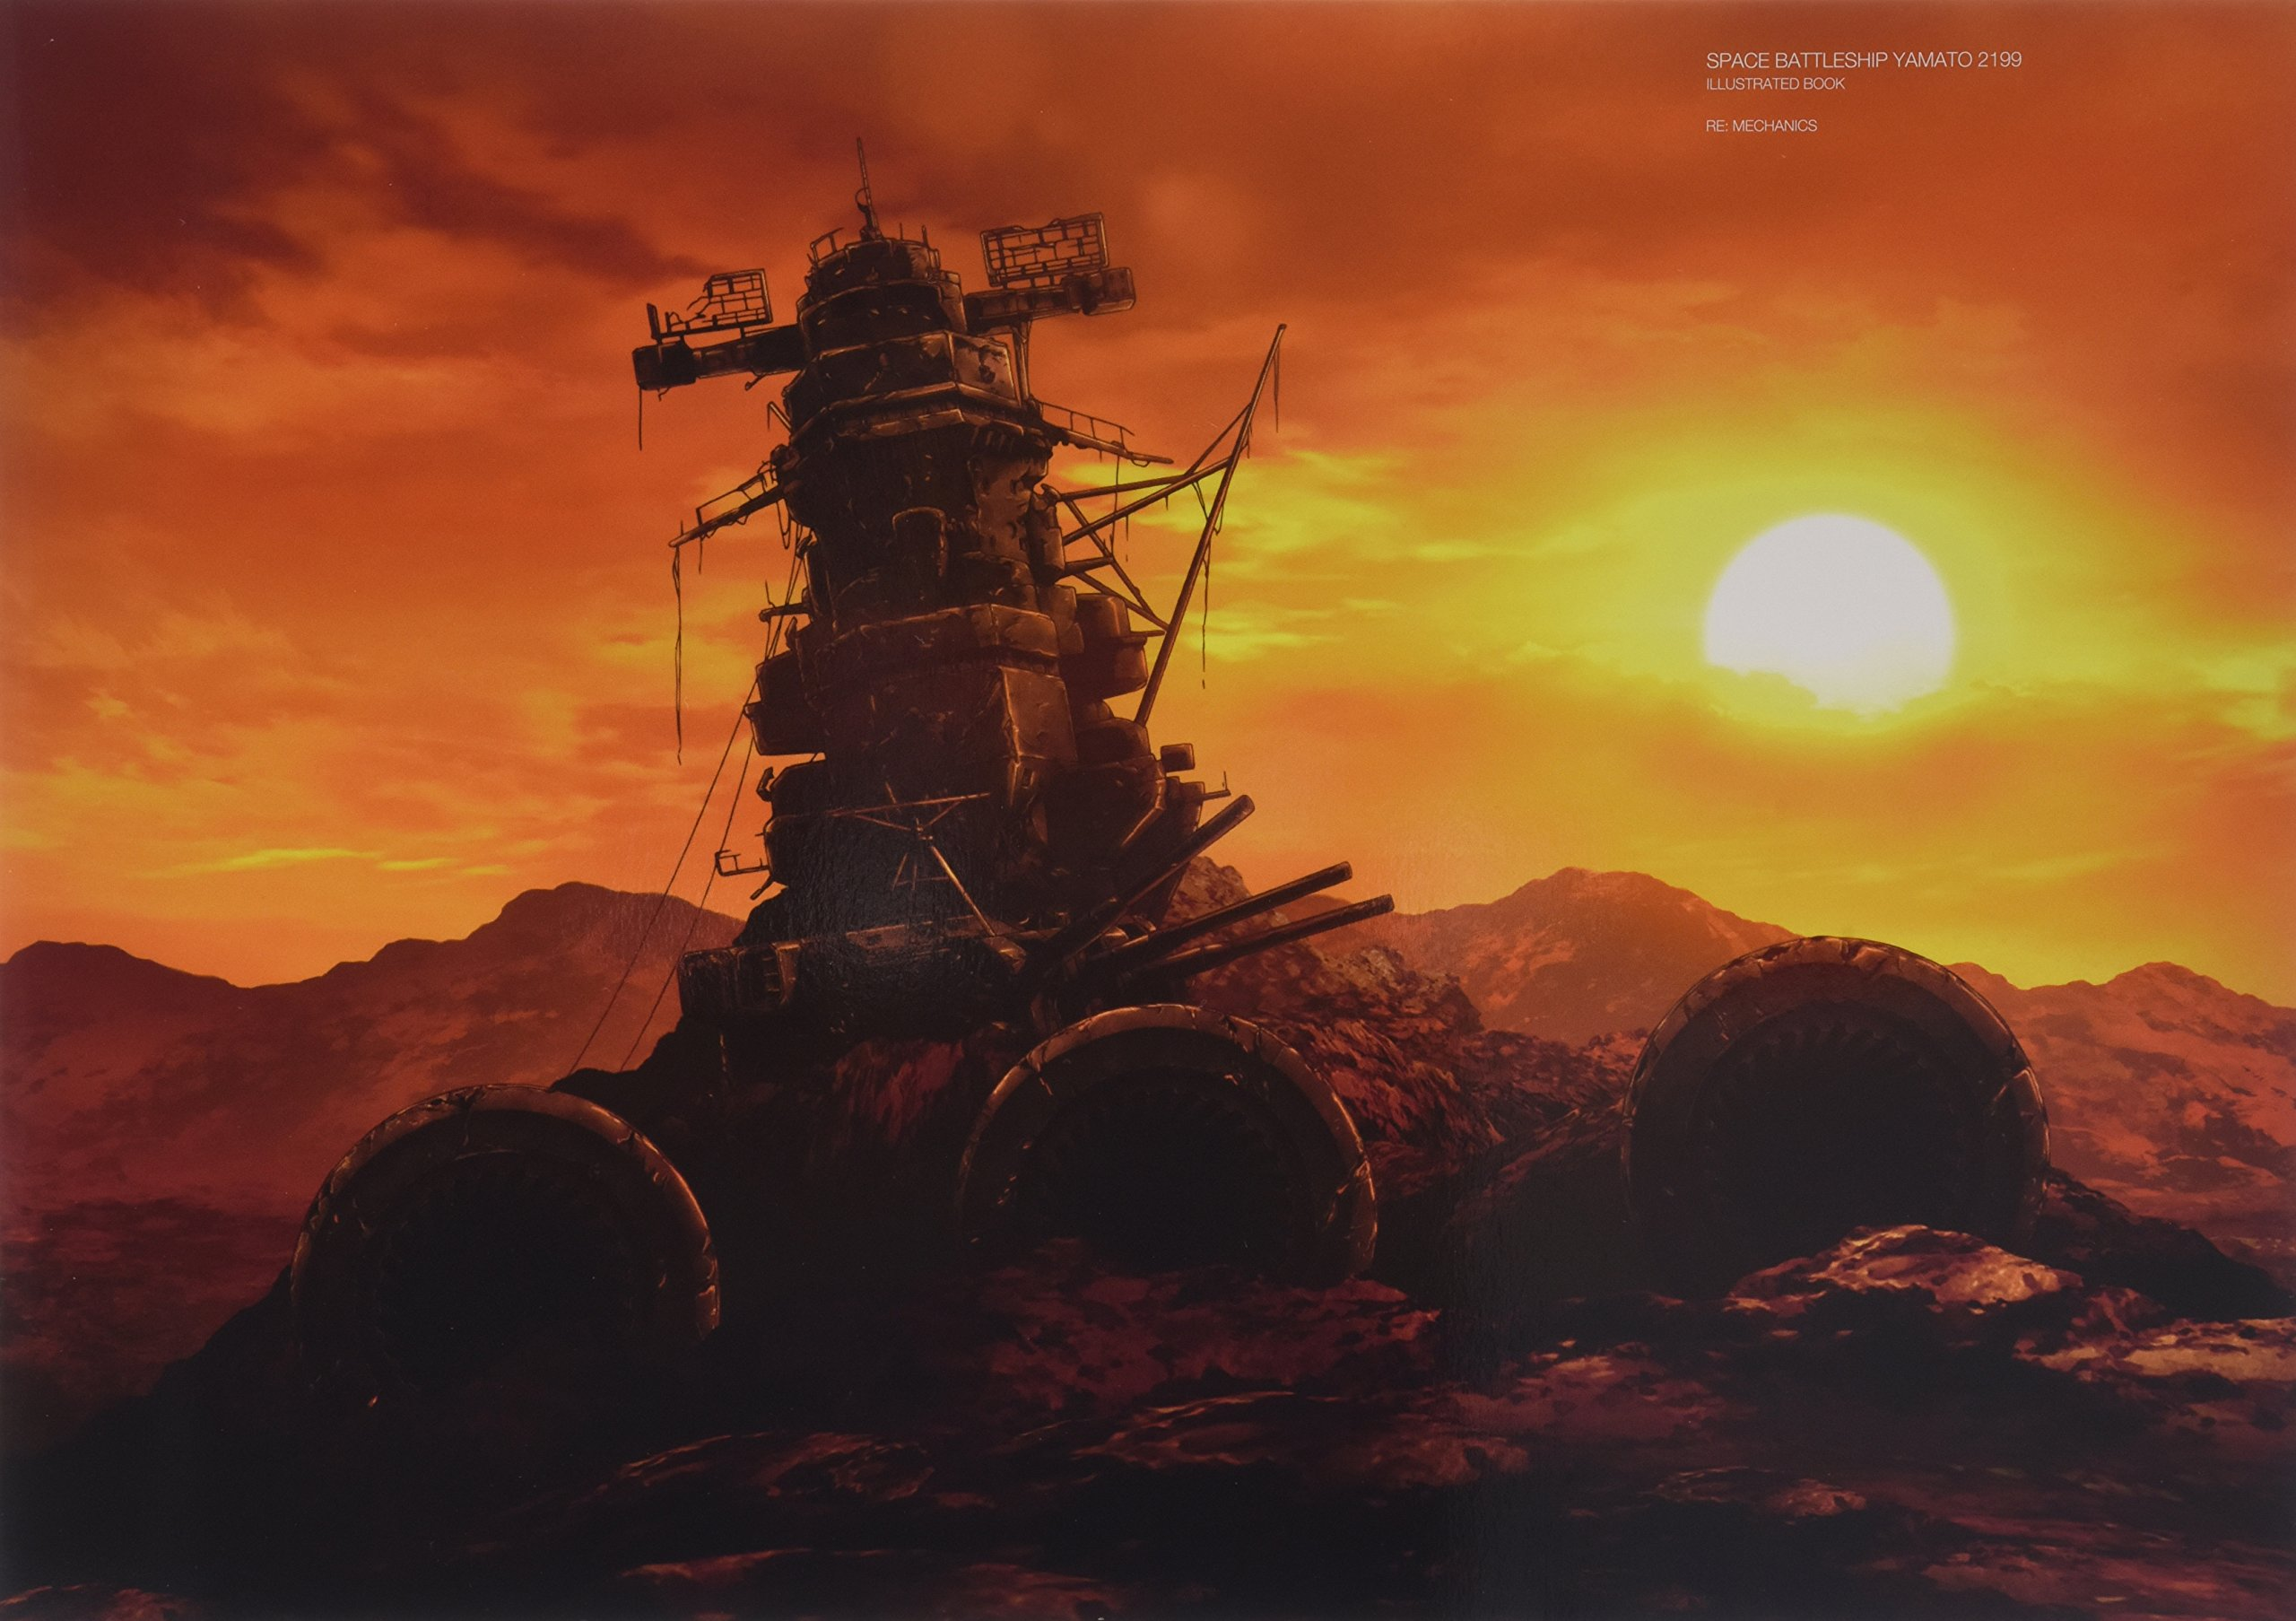 Space Battle Ship Yamato 2199 Re Mechanics Illustration Book